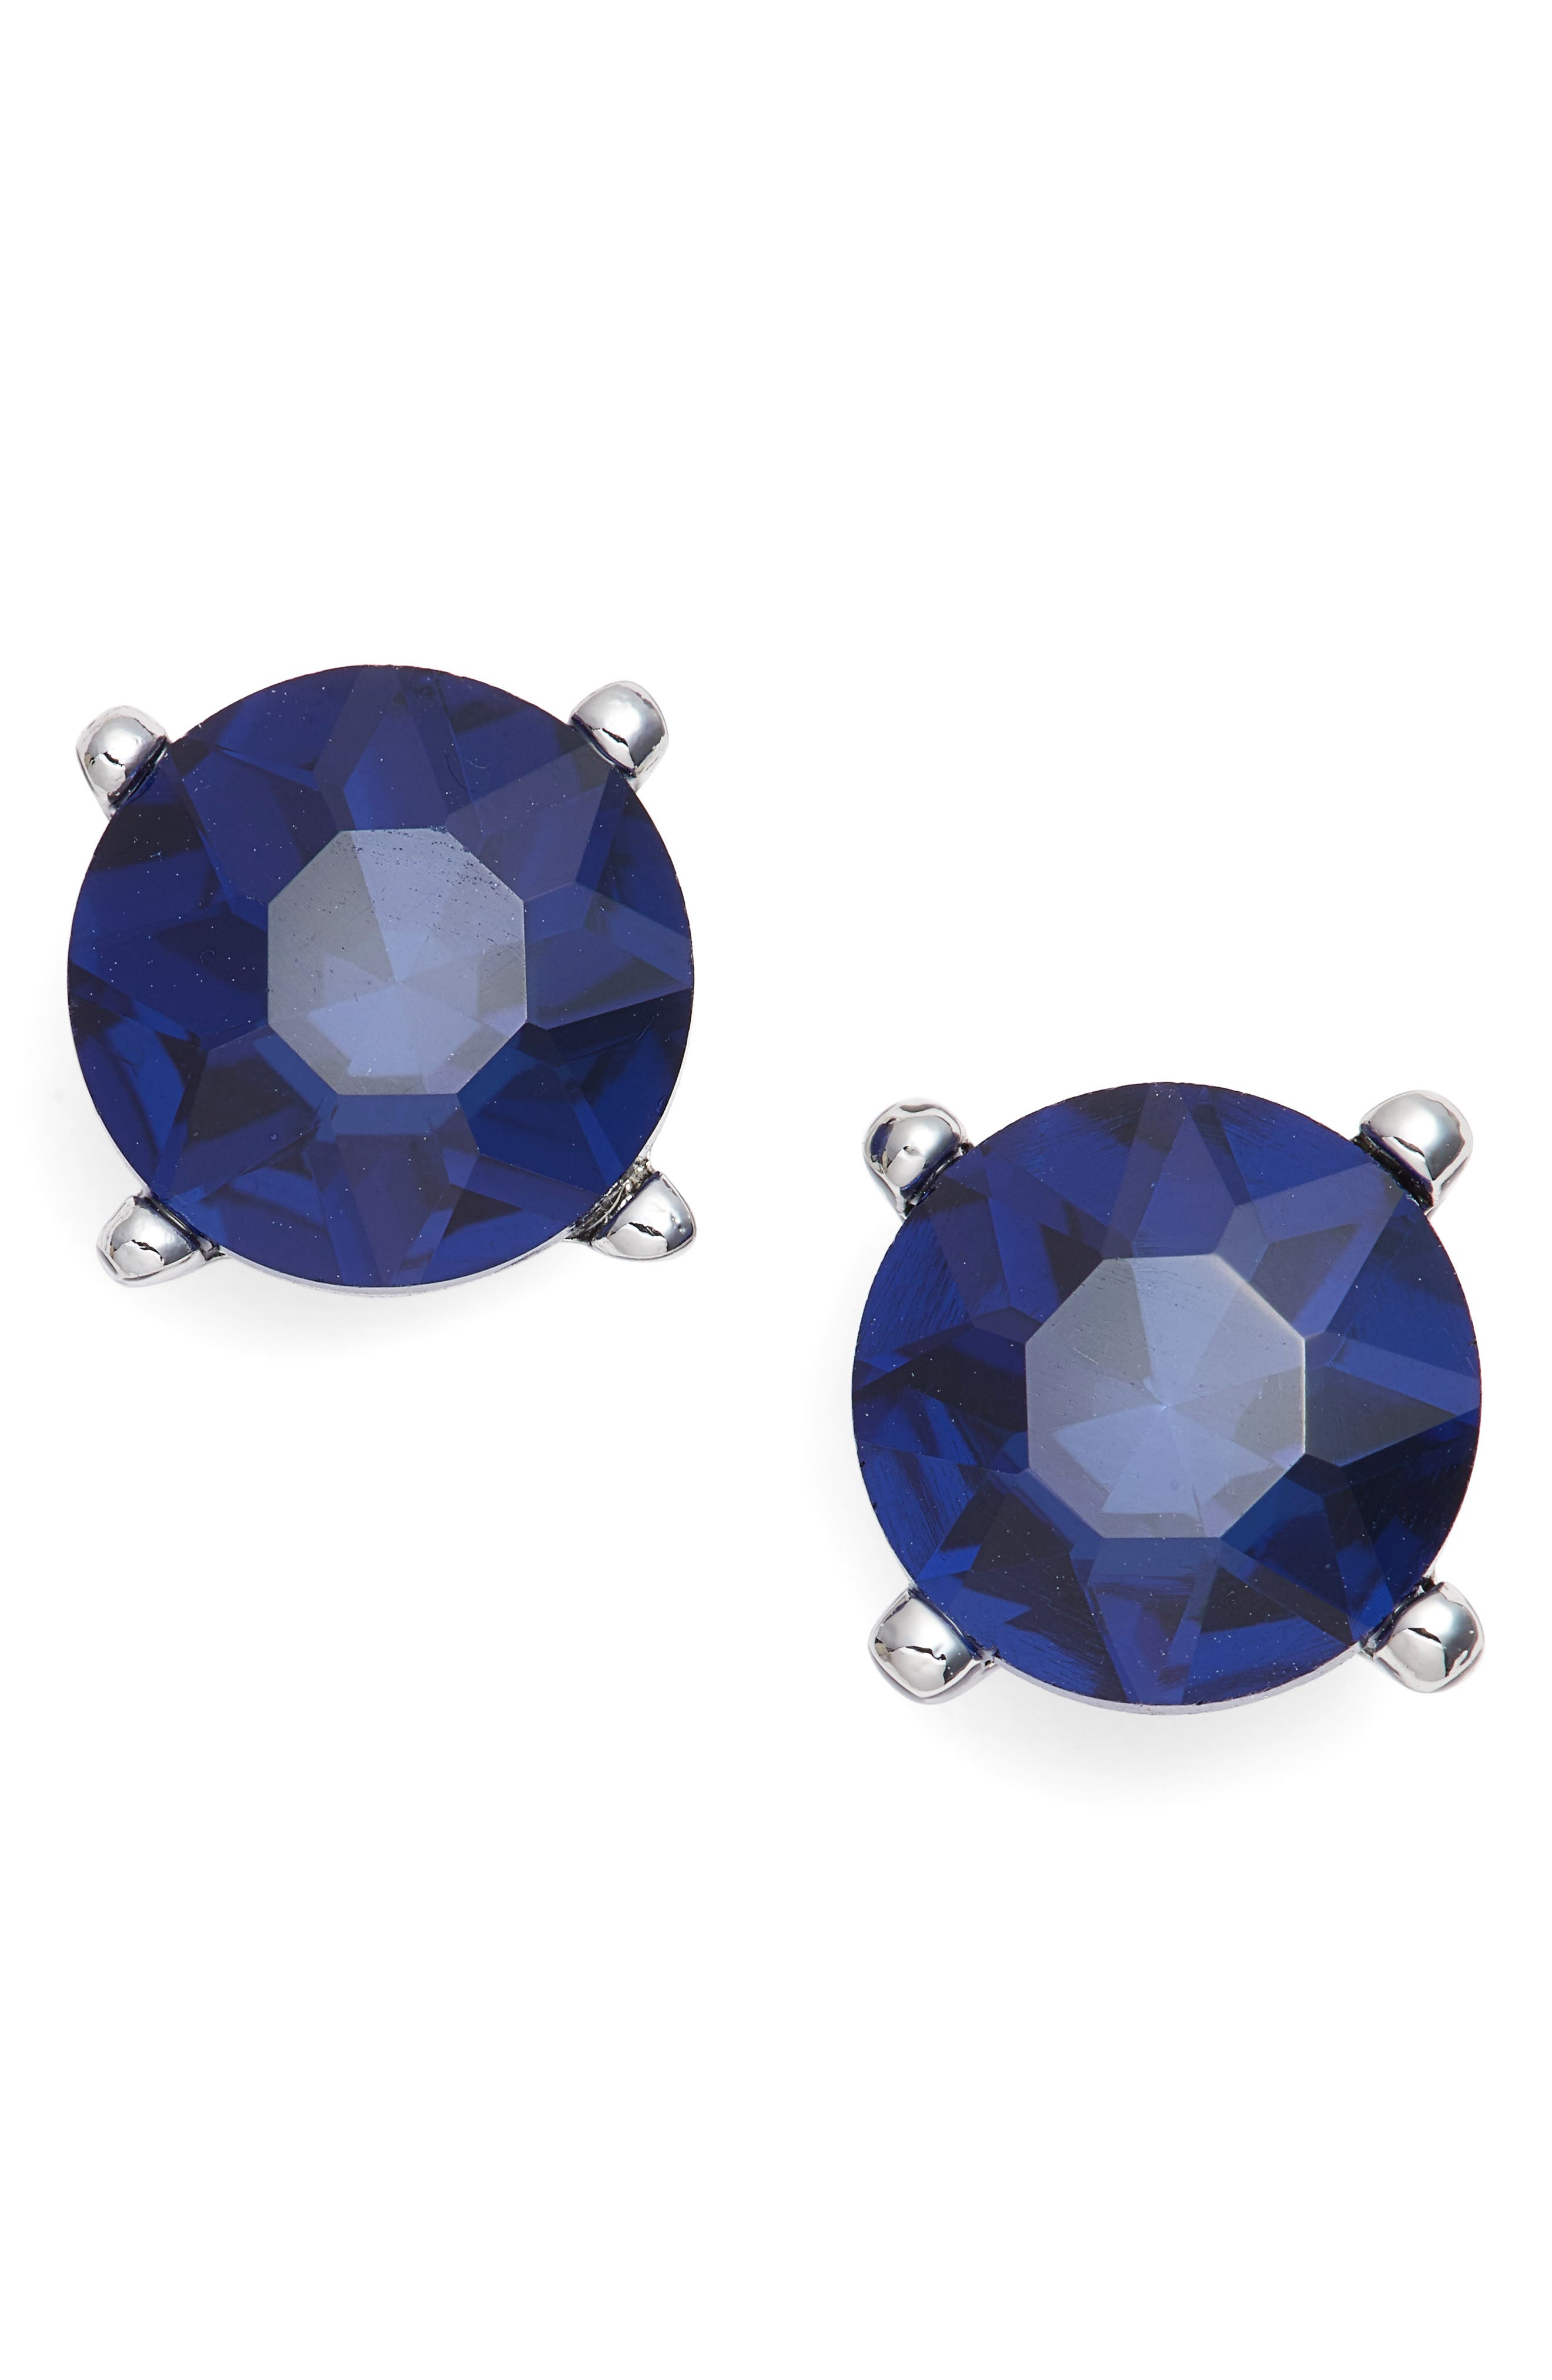 Jewel Stud Earrings,                             Main thumbnail 1, color,                             040